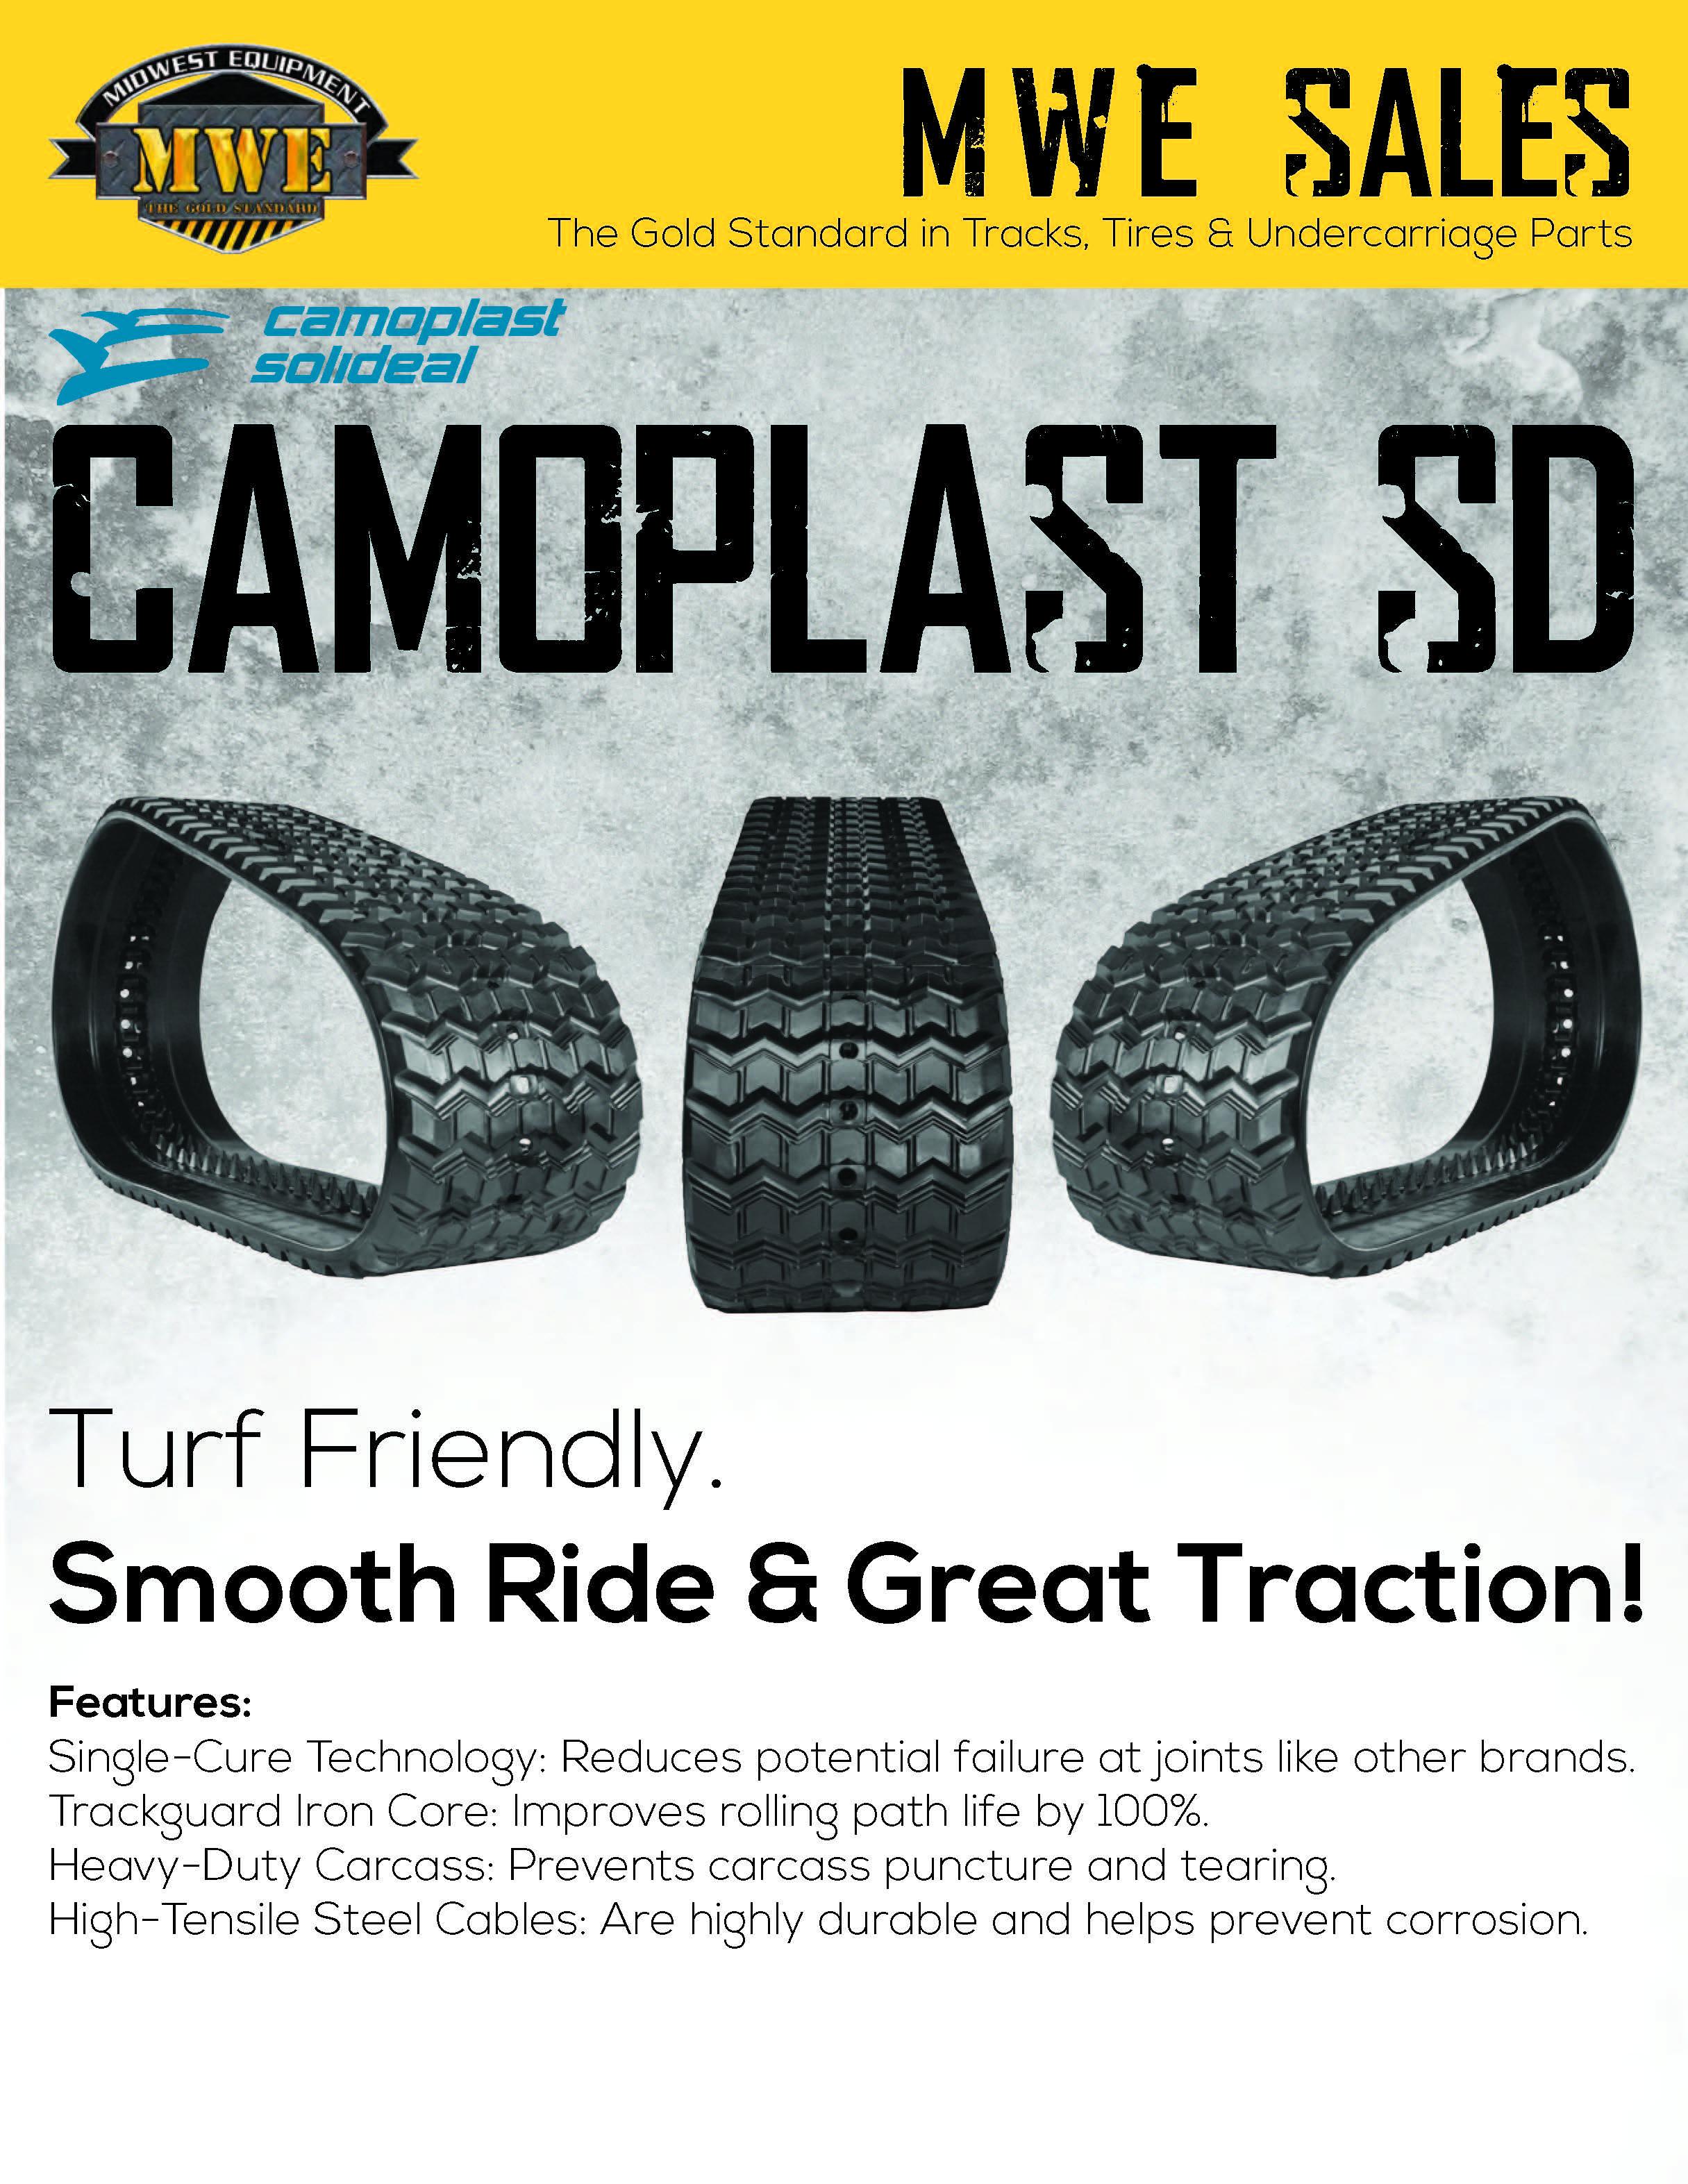 solideal camoplast sd.jpg